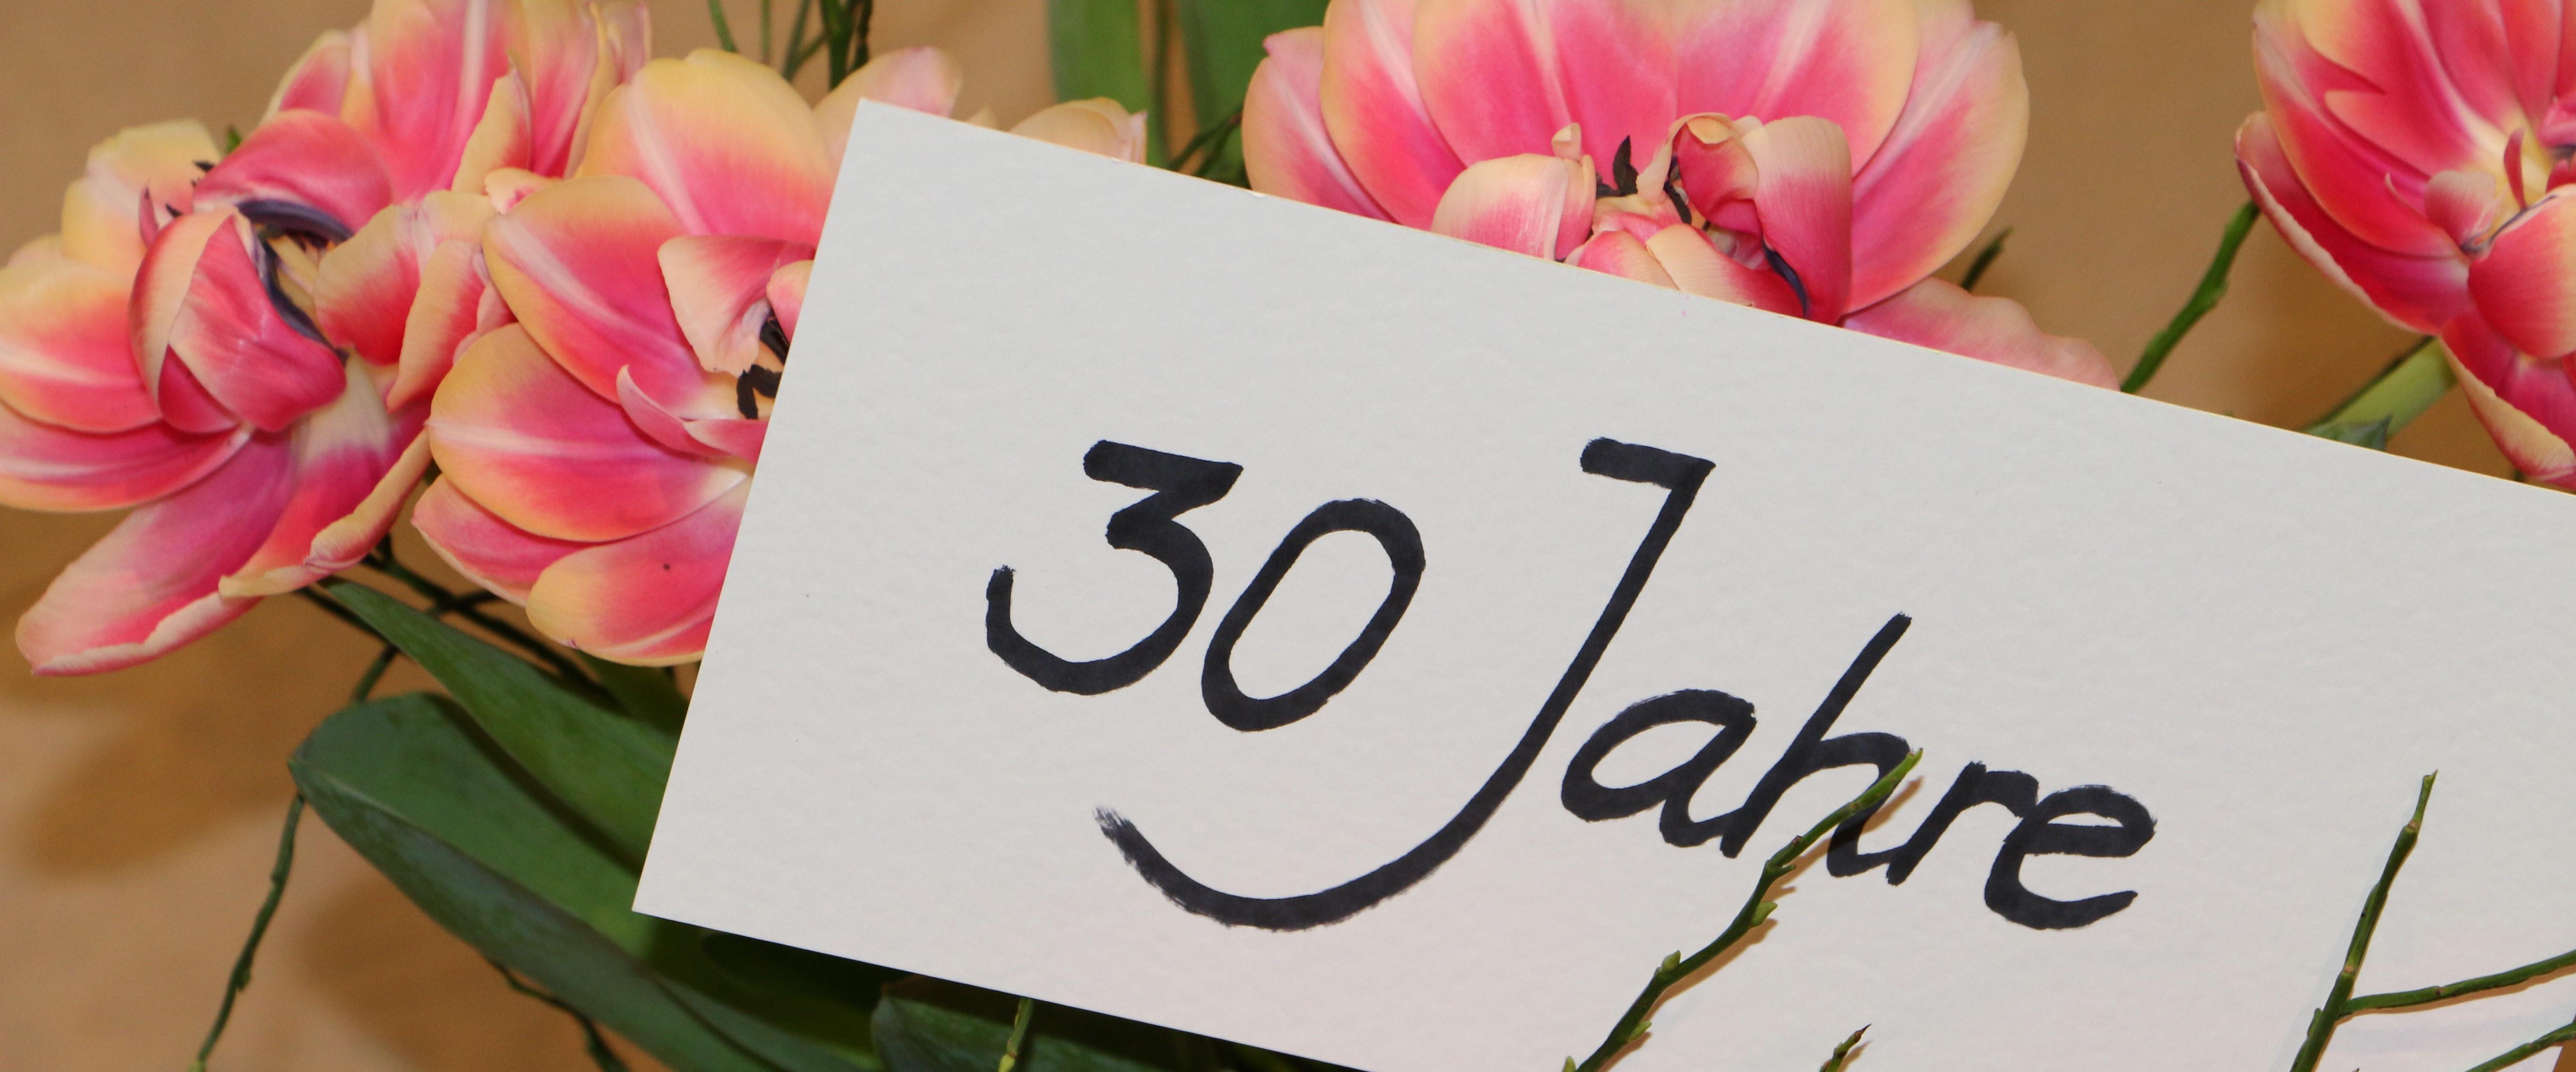 wir feiern 30 Jahre